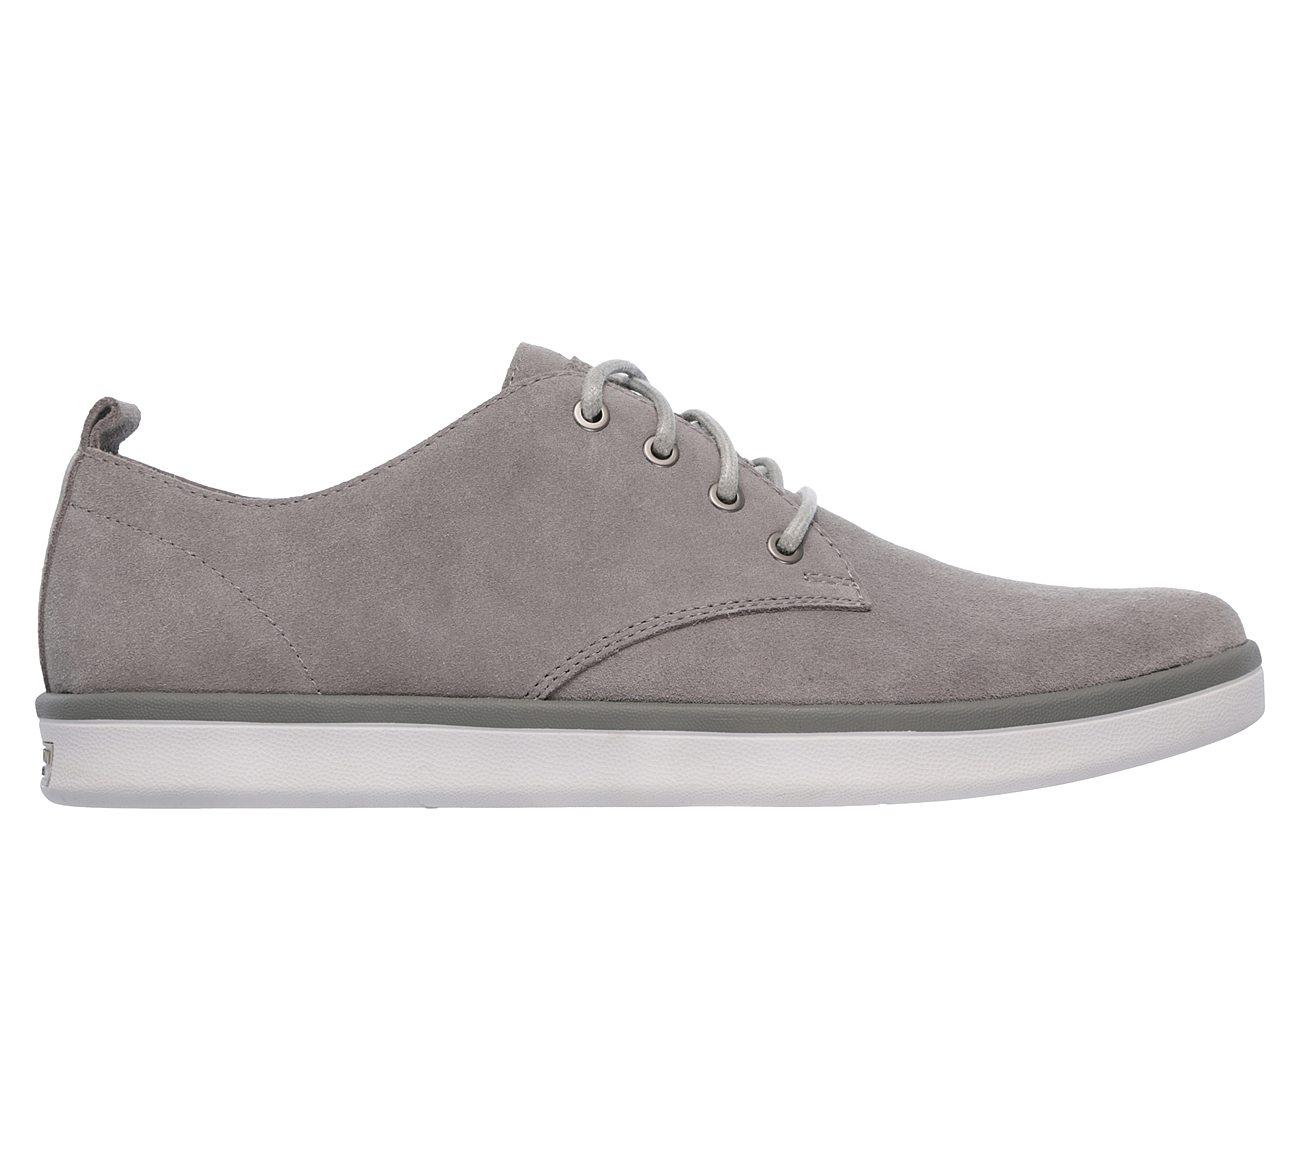 Buy SKECHERS Jaylee Mark Nason Shoes only $45.00